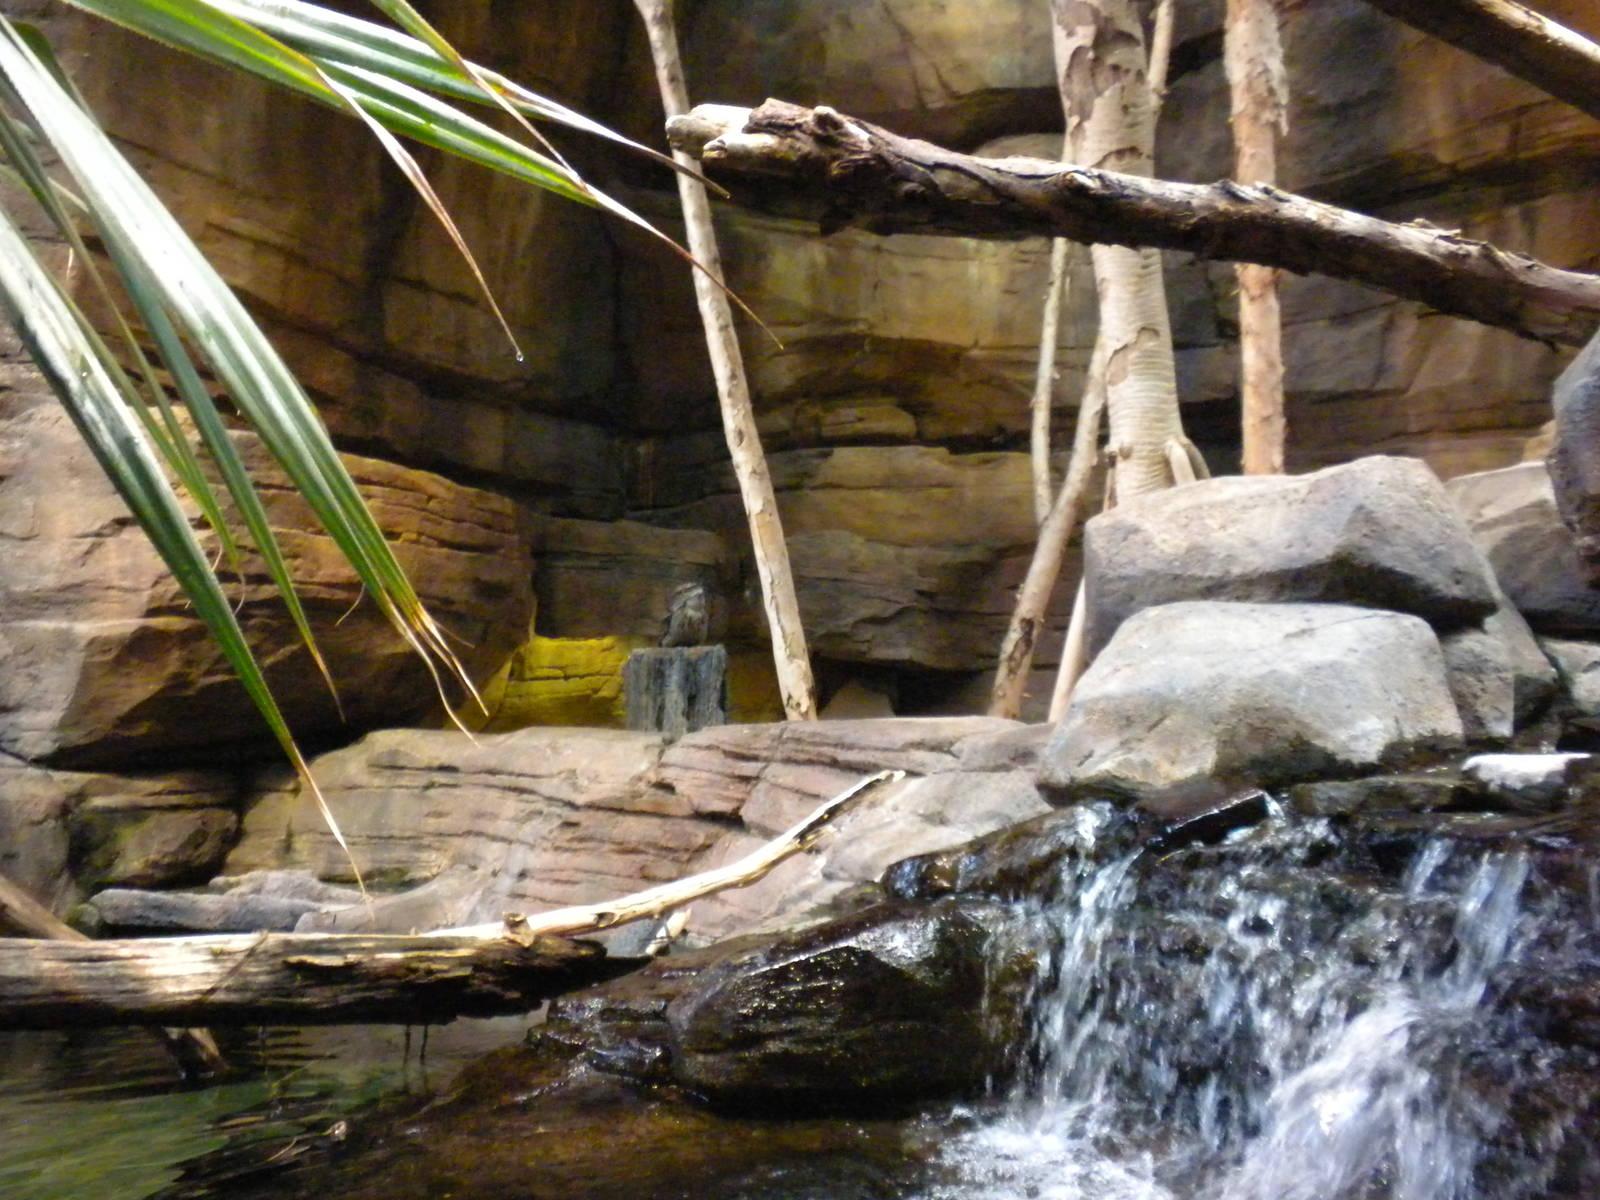 Animal Planet Australia Wild Extremes Aquarium National - Exploring Mars